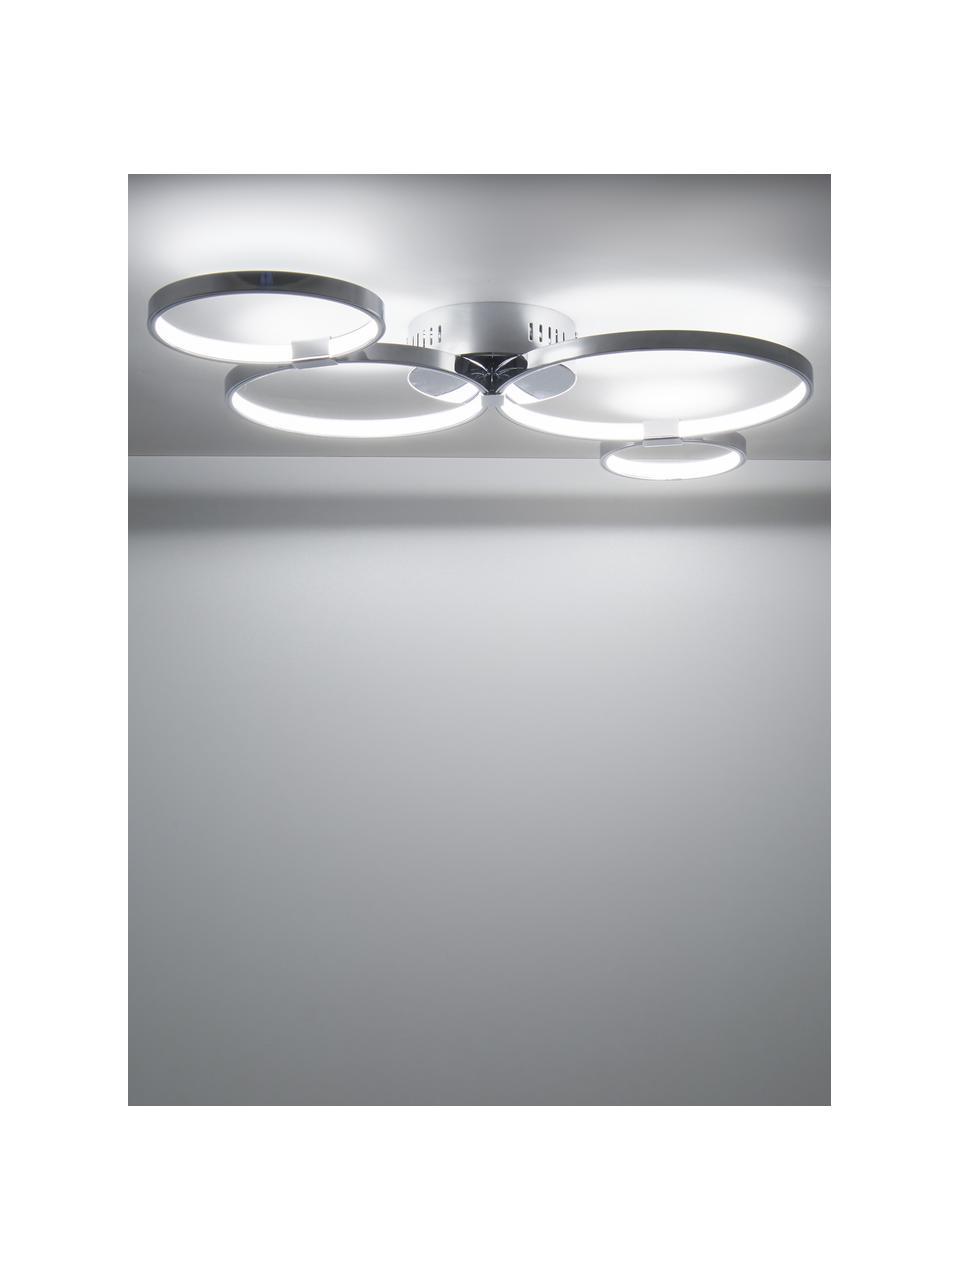 Lampa sufitowa LED Solexa, Chrom, S 75 x W 7 cm